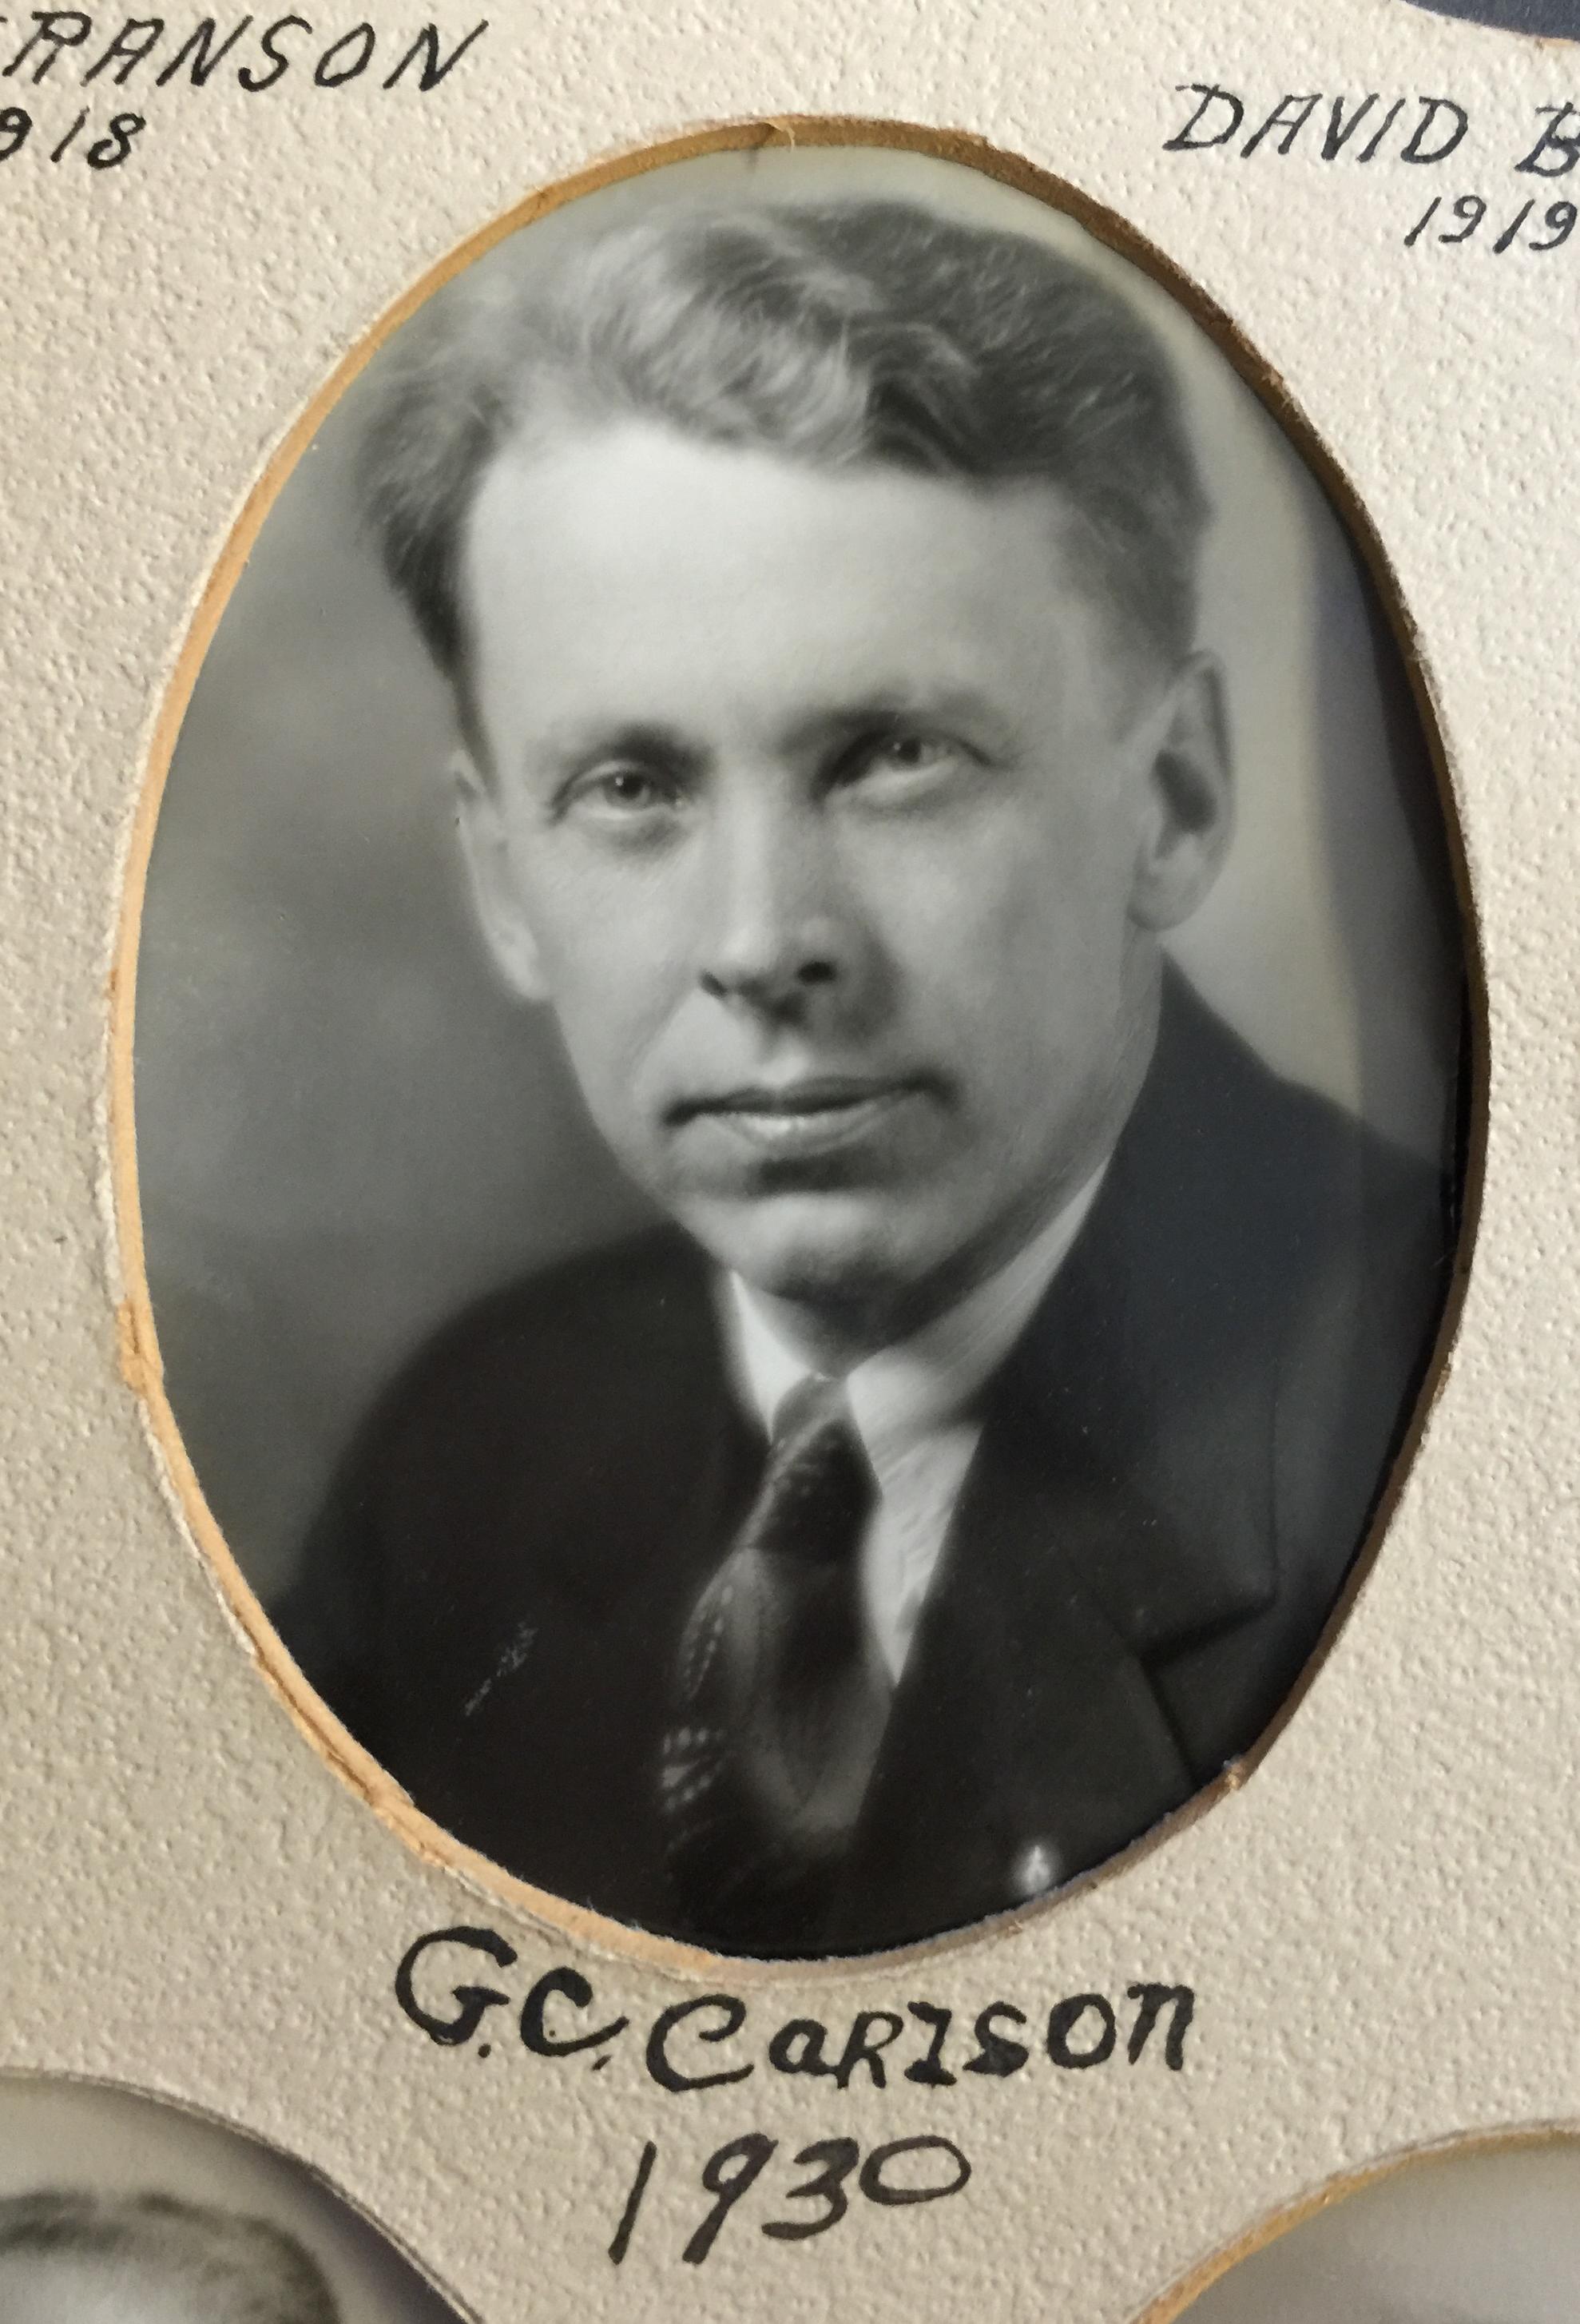 1930 G.C. Carlson